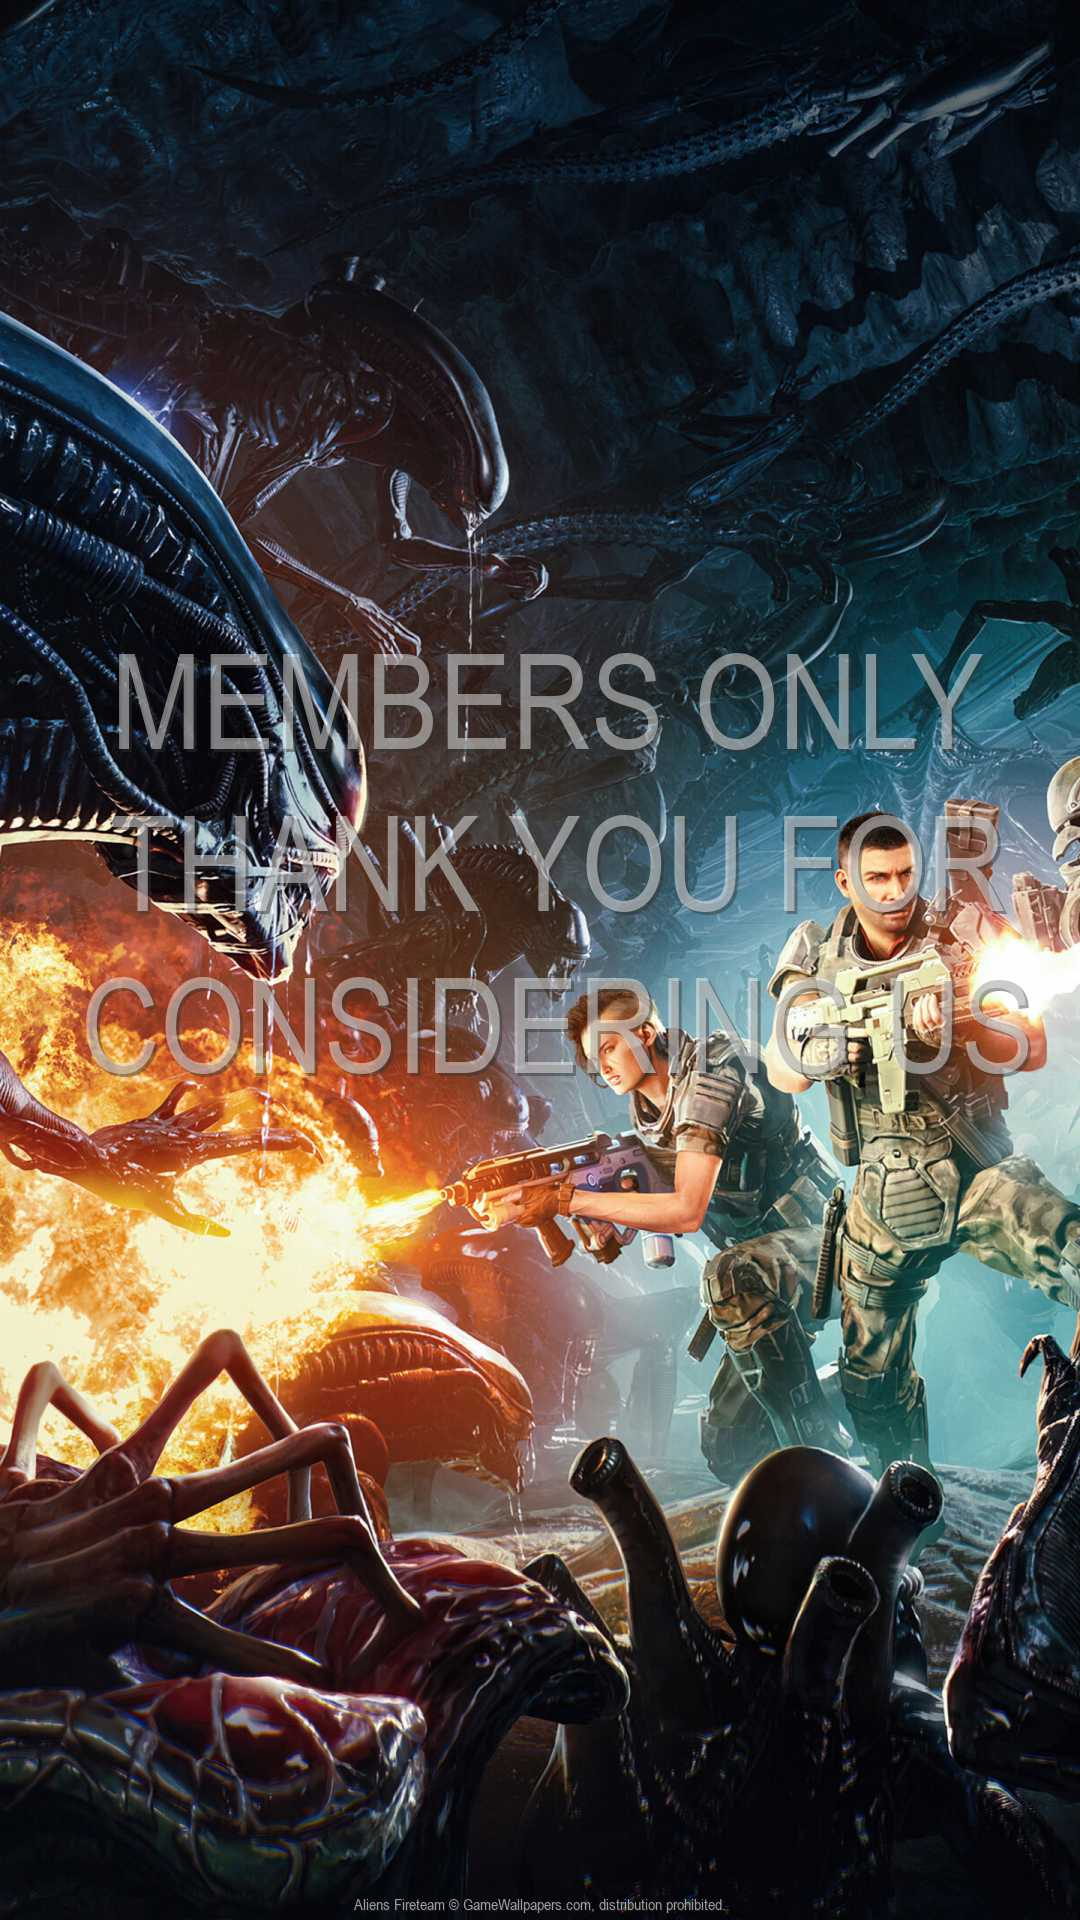 Aliens: Fireteam 1080p Vertical Mobile wallpaper or background 01